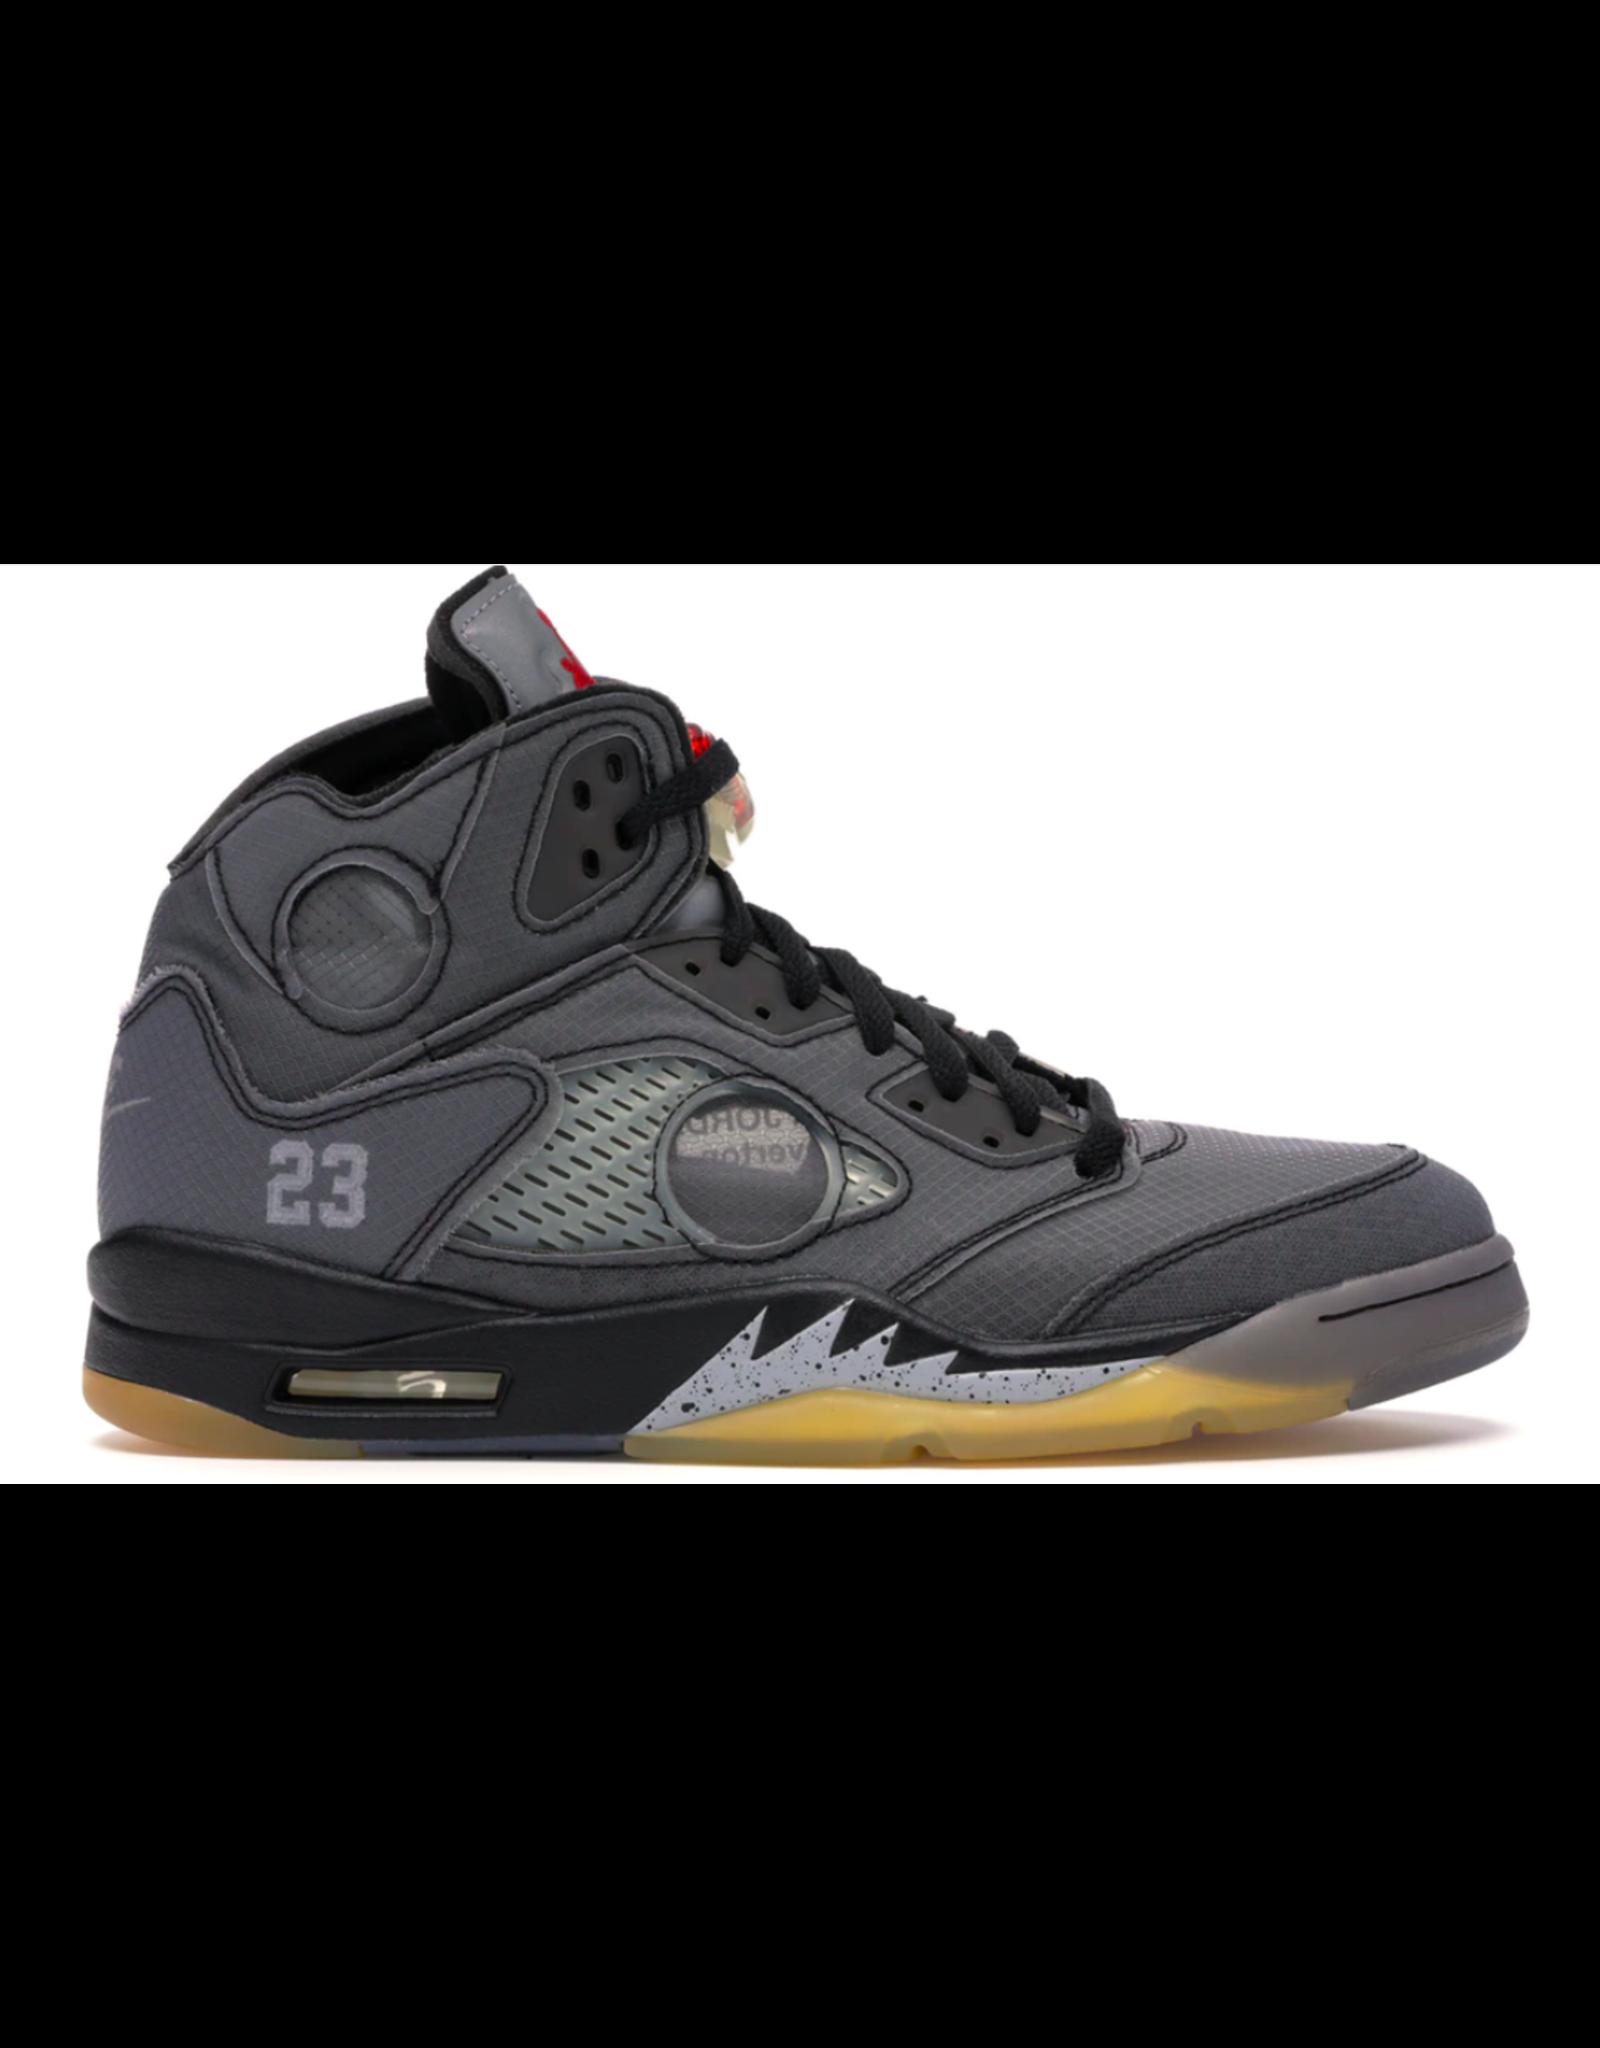 Jordan 5 Retro Off-White Black